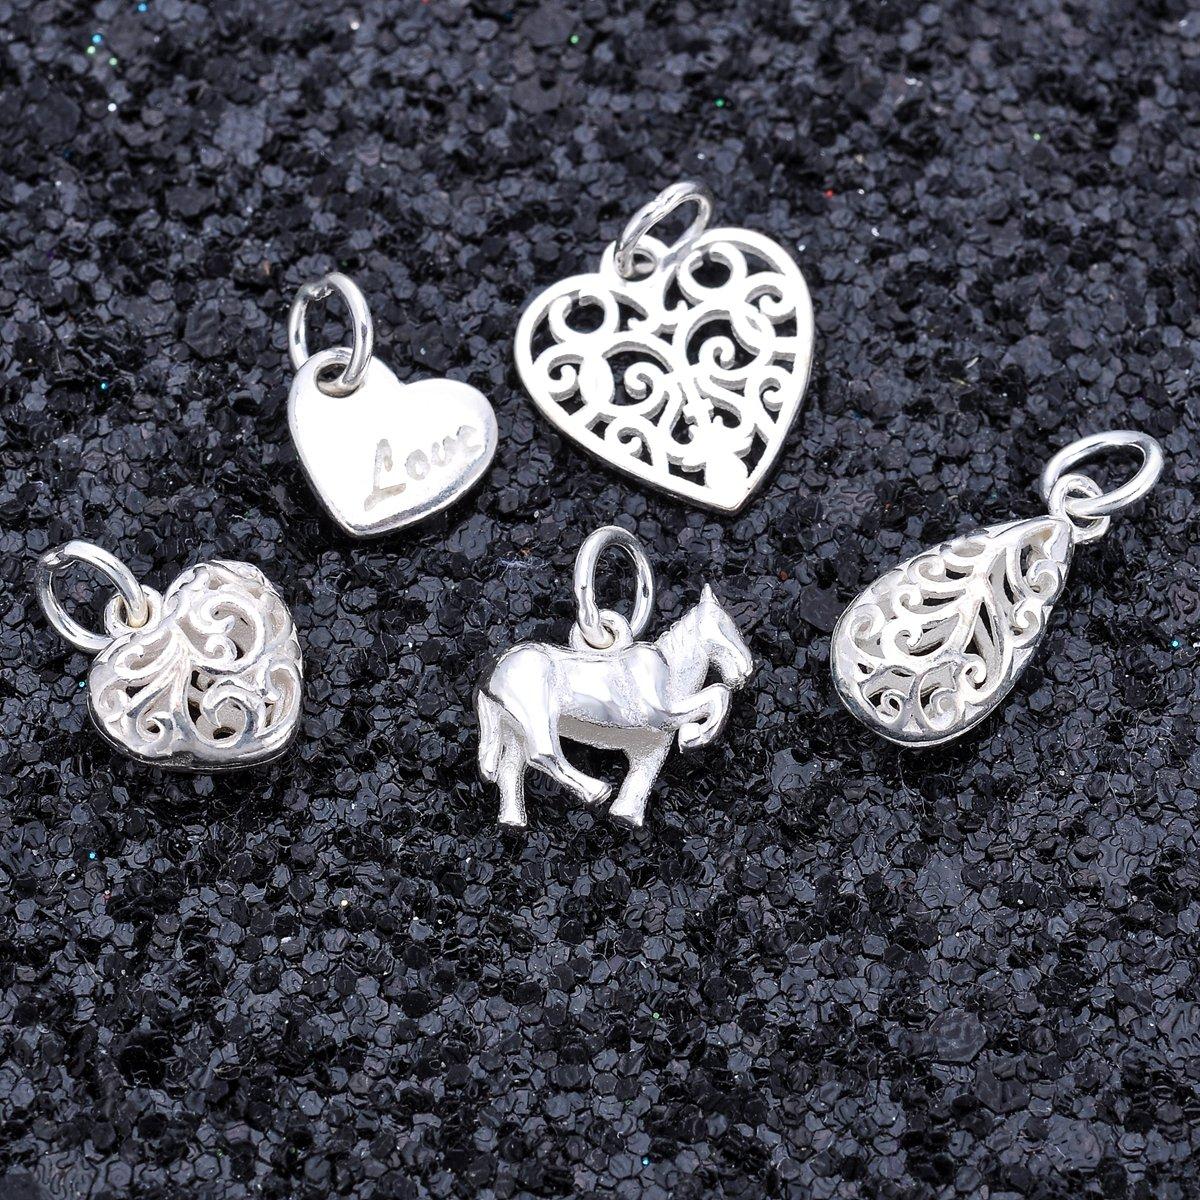 YF 3pcs 925 Sterling Silver Hollow Vine Heart Pendant Charm Findings DIY Jewellery Making 10.5mmx10mm